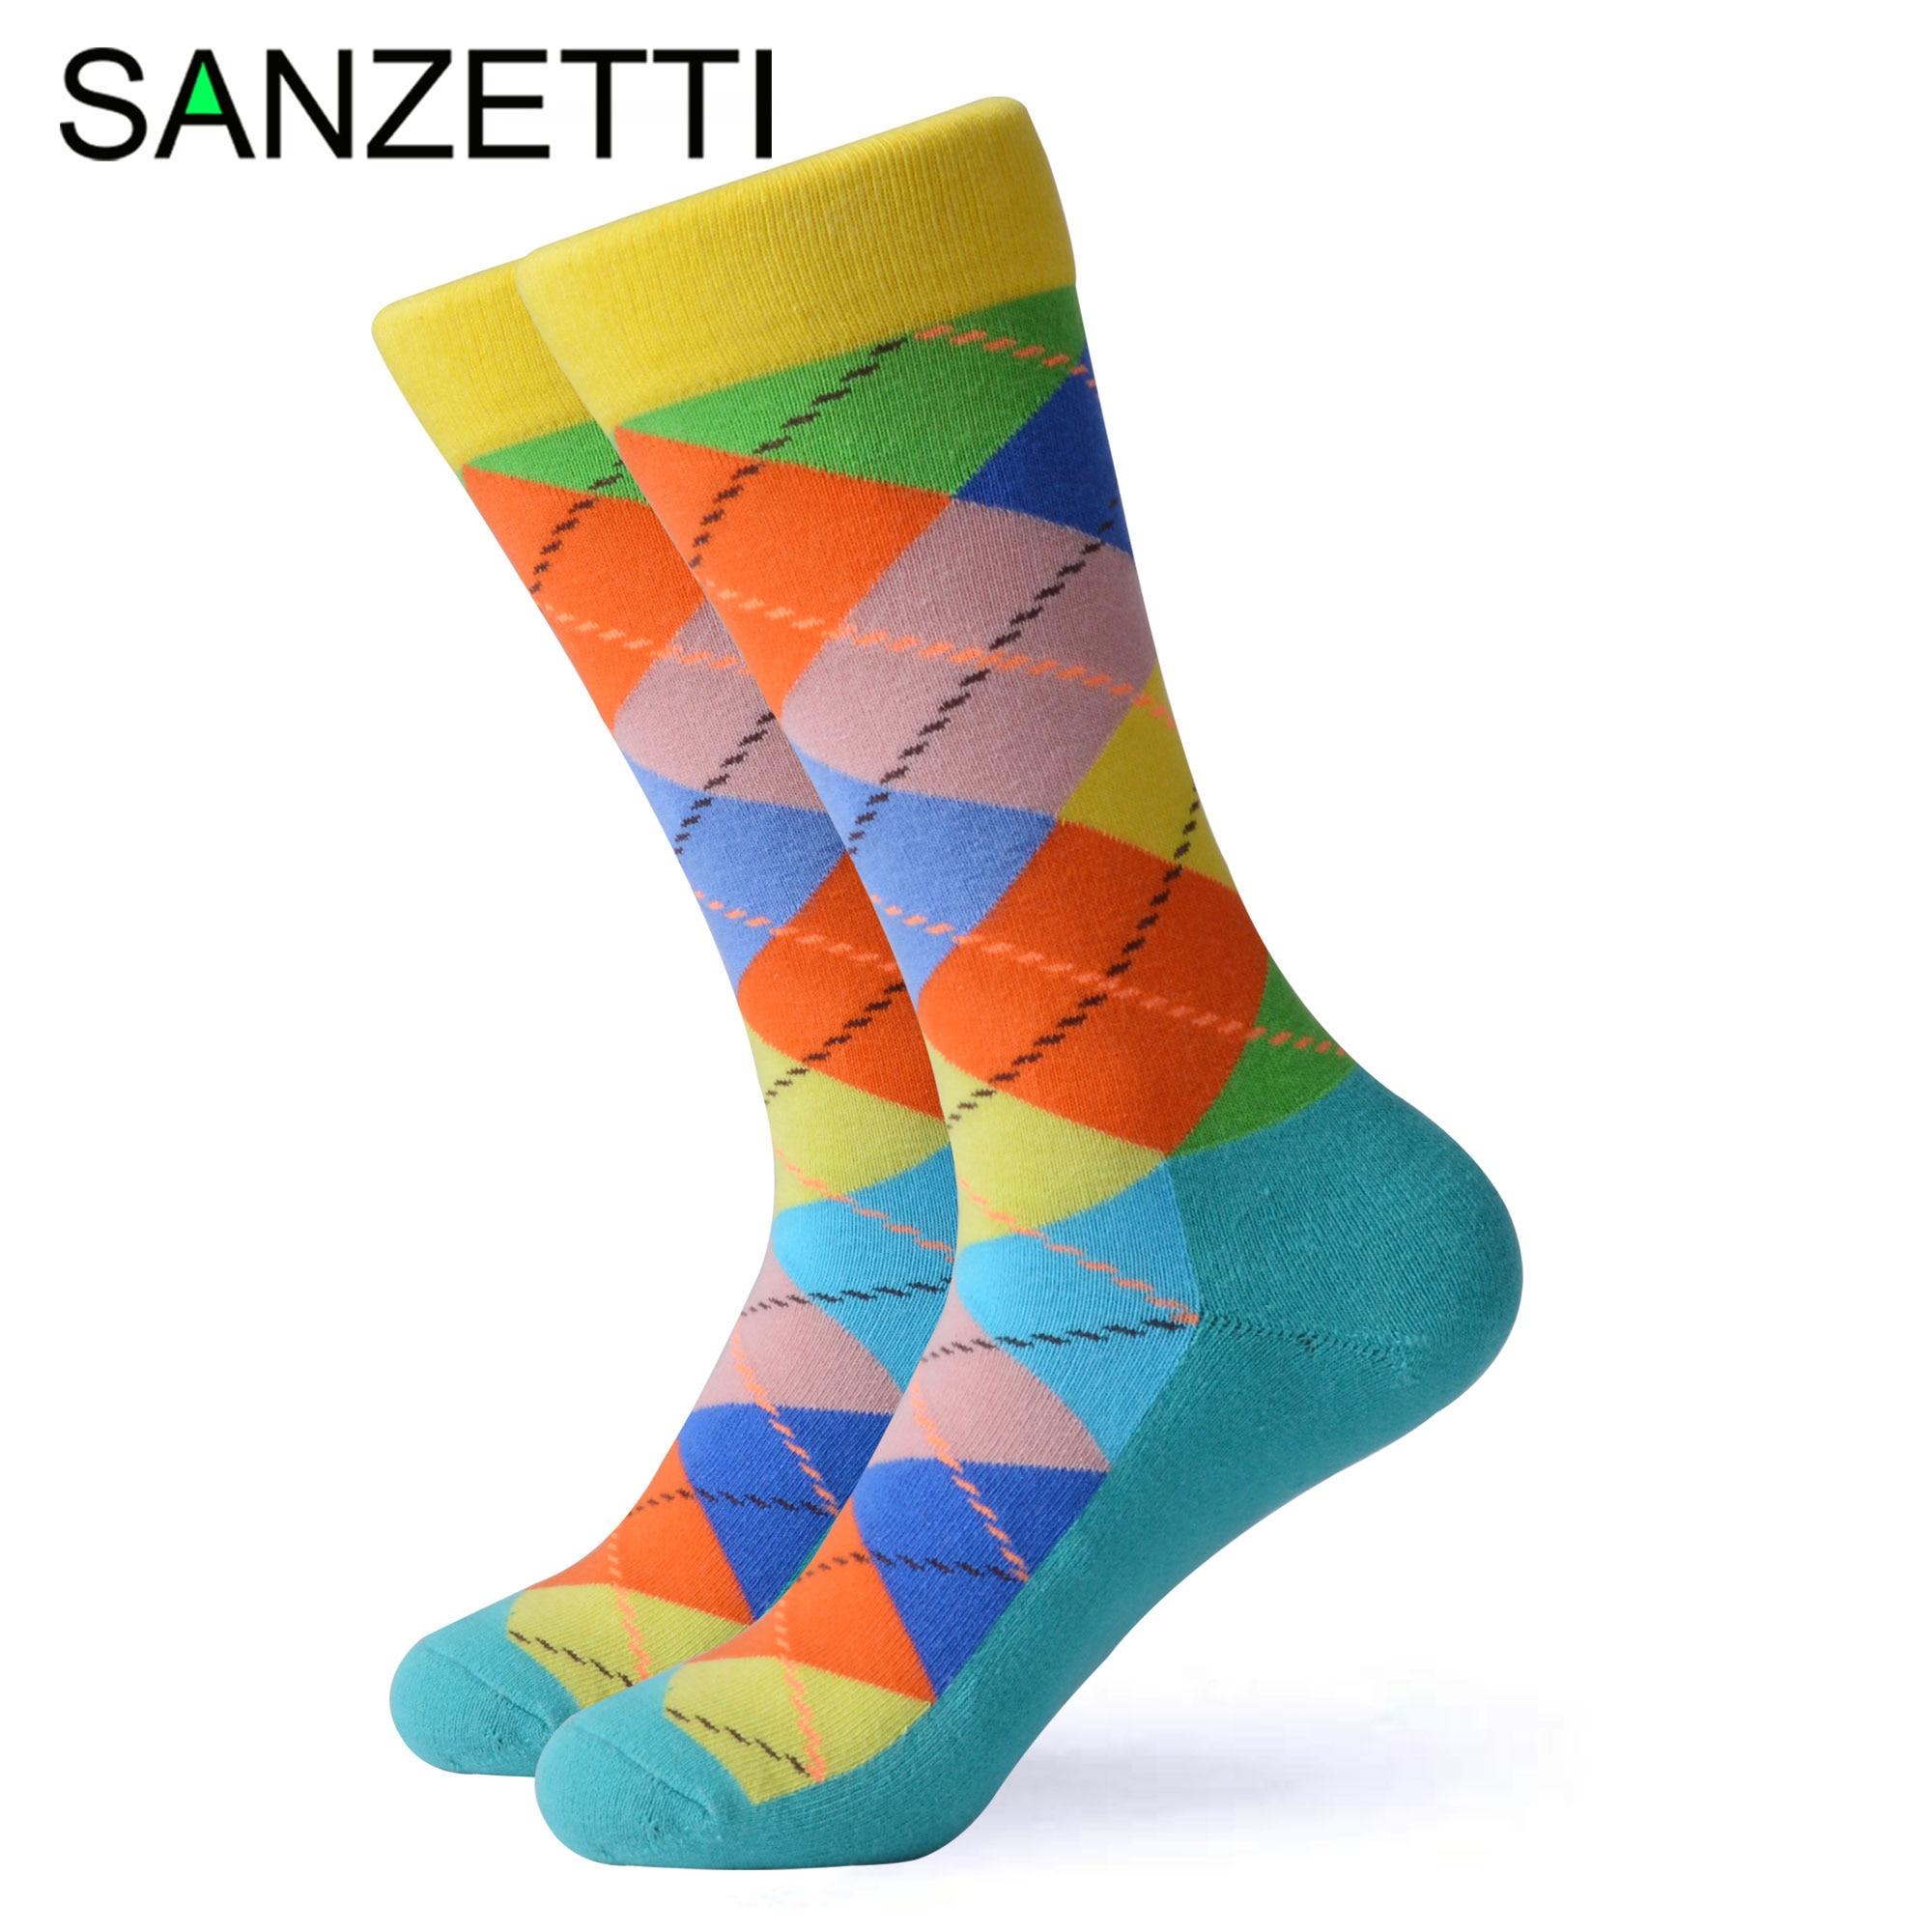 SANZETTI 1 Pair Happy Socks High Quality Men's Colorful Comfortable Combed Cotton Terry Socks Novelty Gift Wedding Dress Socks